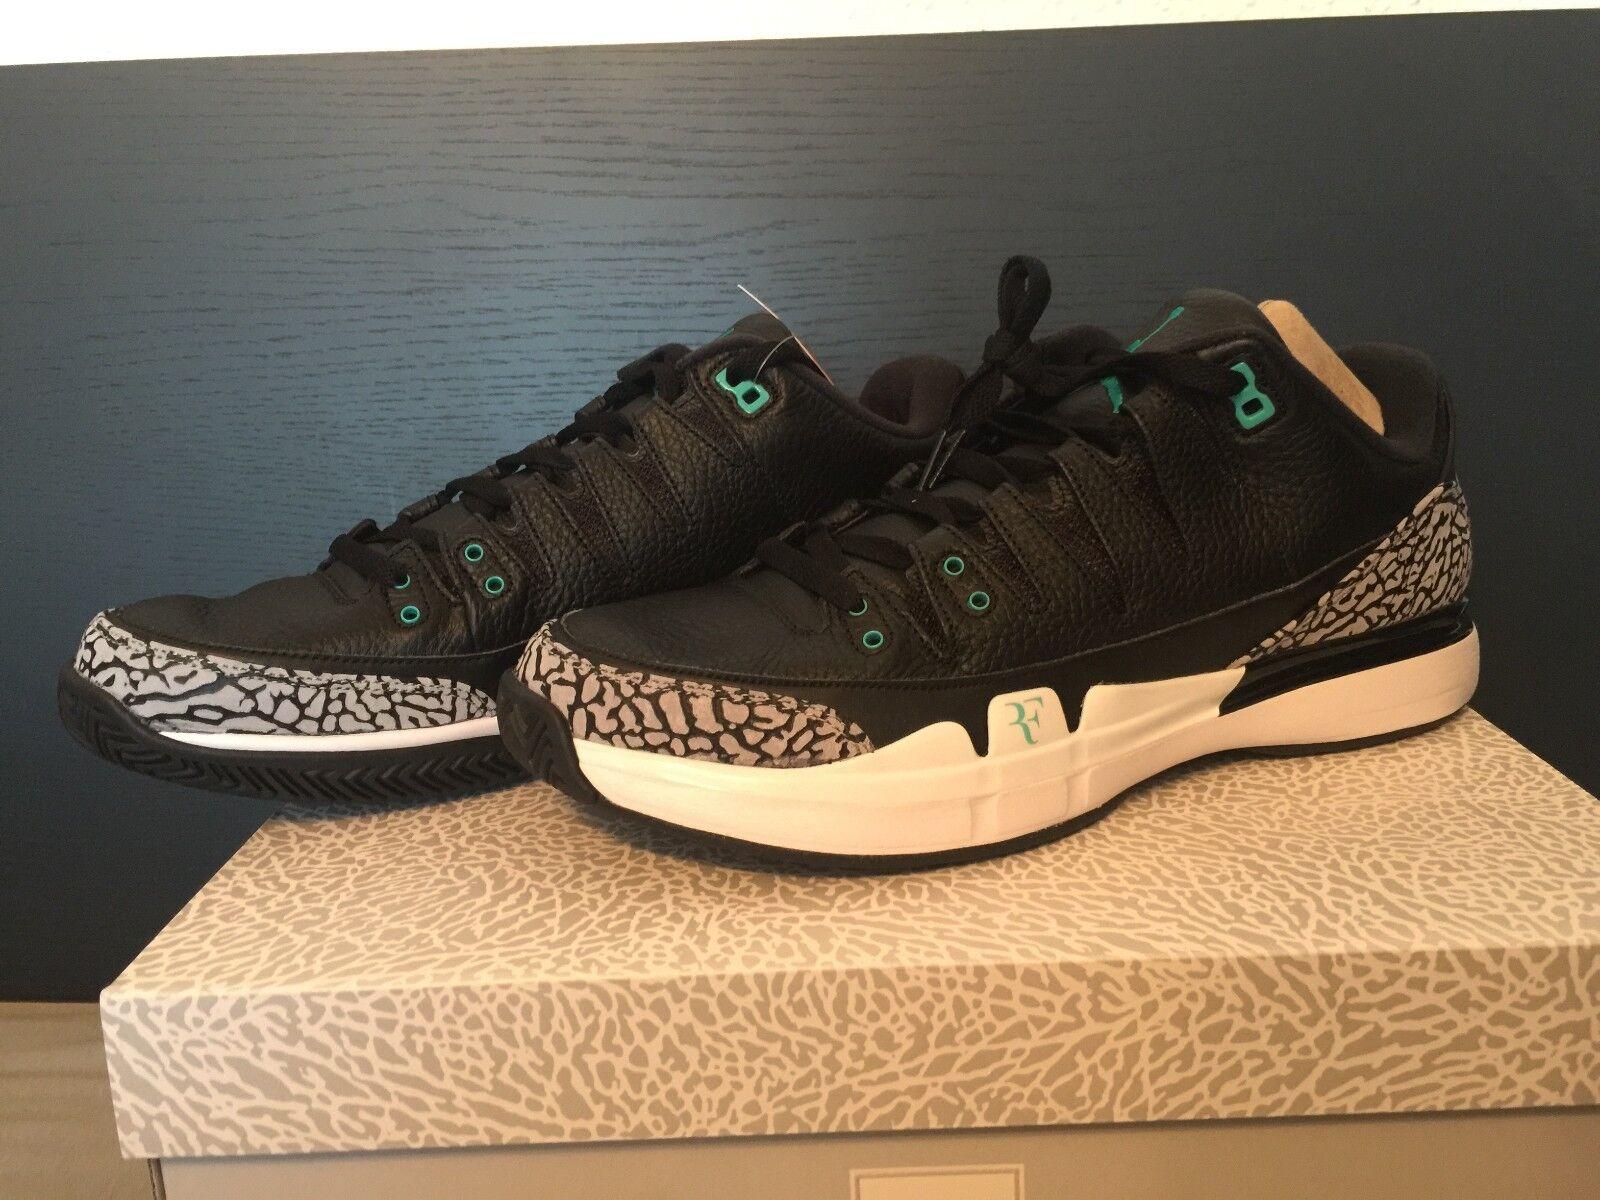 Nike Zoom Vapor RF x AJ3 ATMOS 2017 - Air Jordan - Roger Federer - 031 - US 12,5